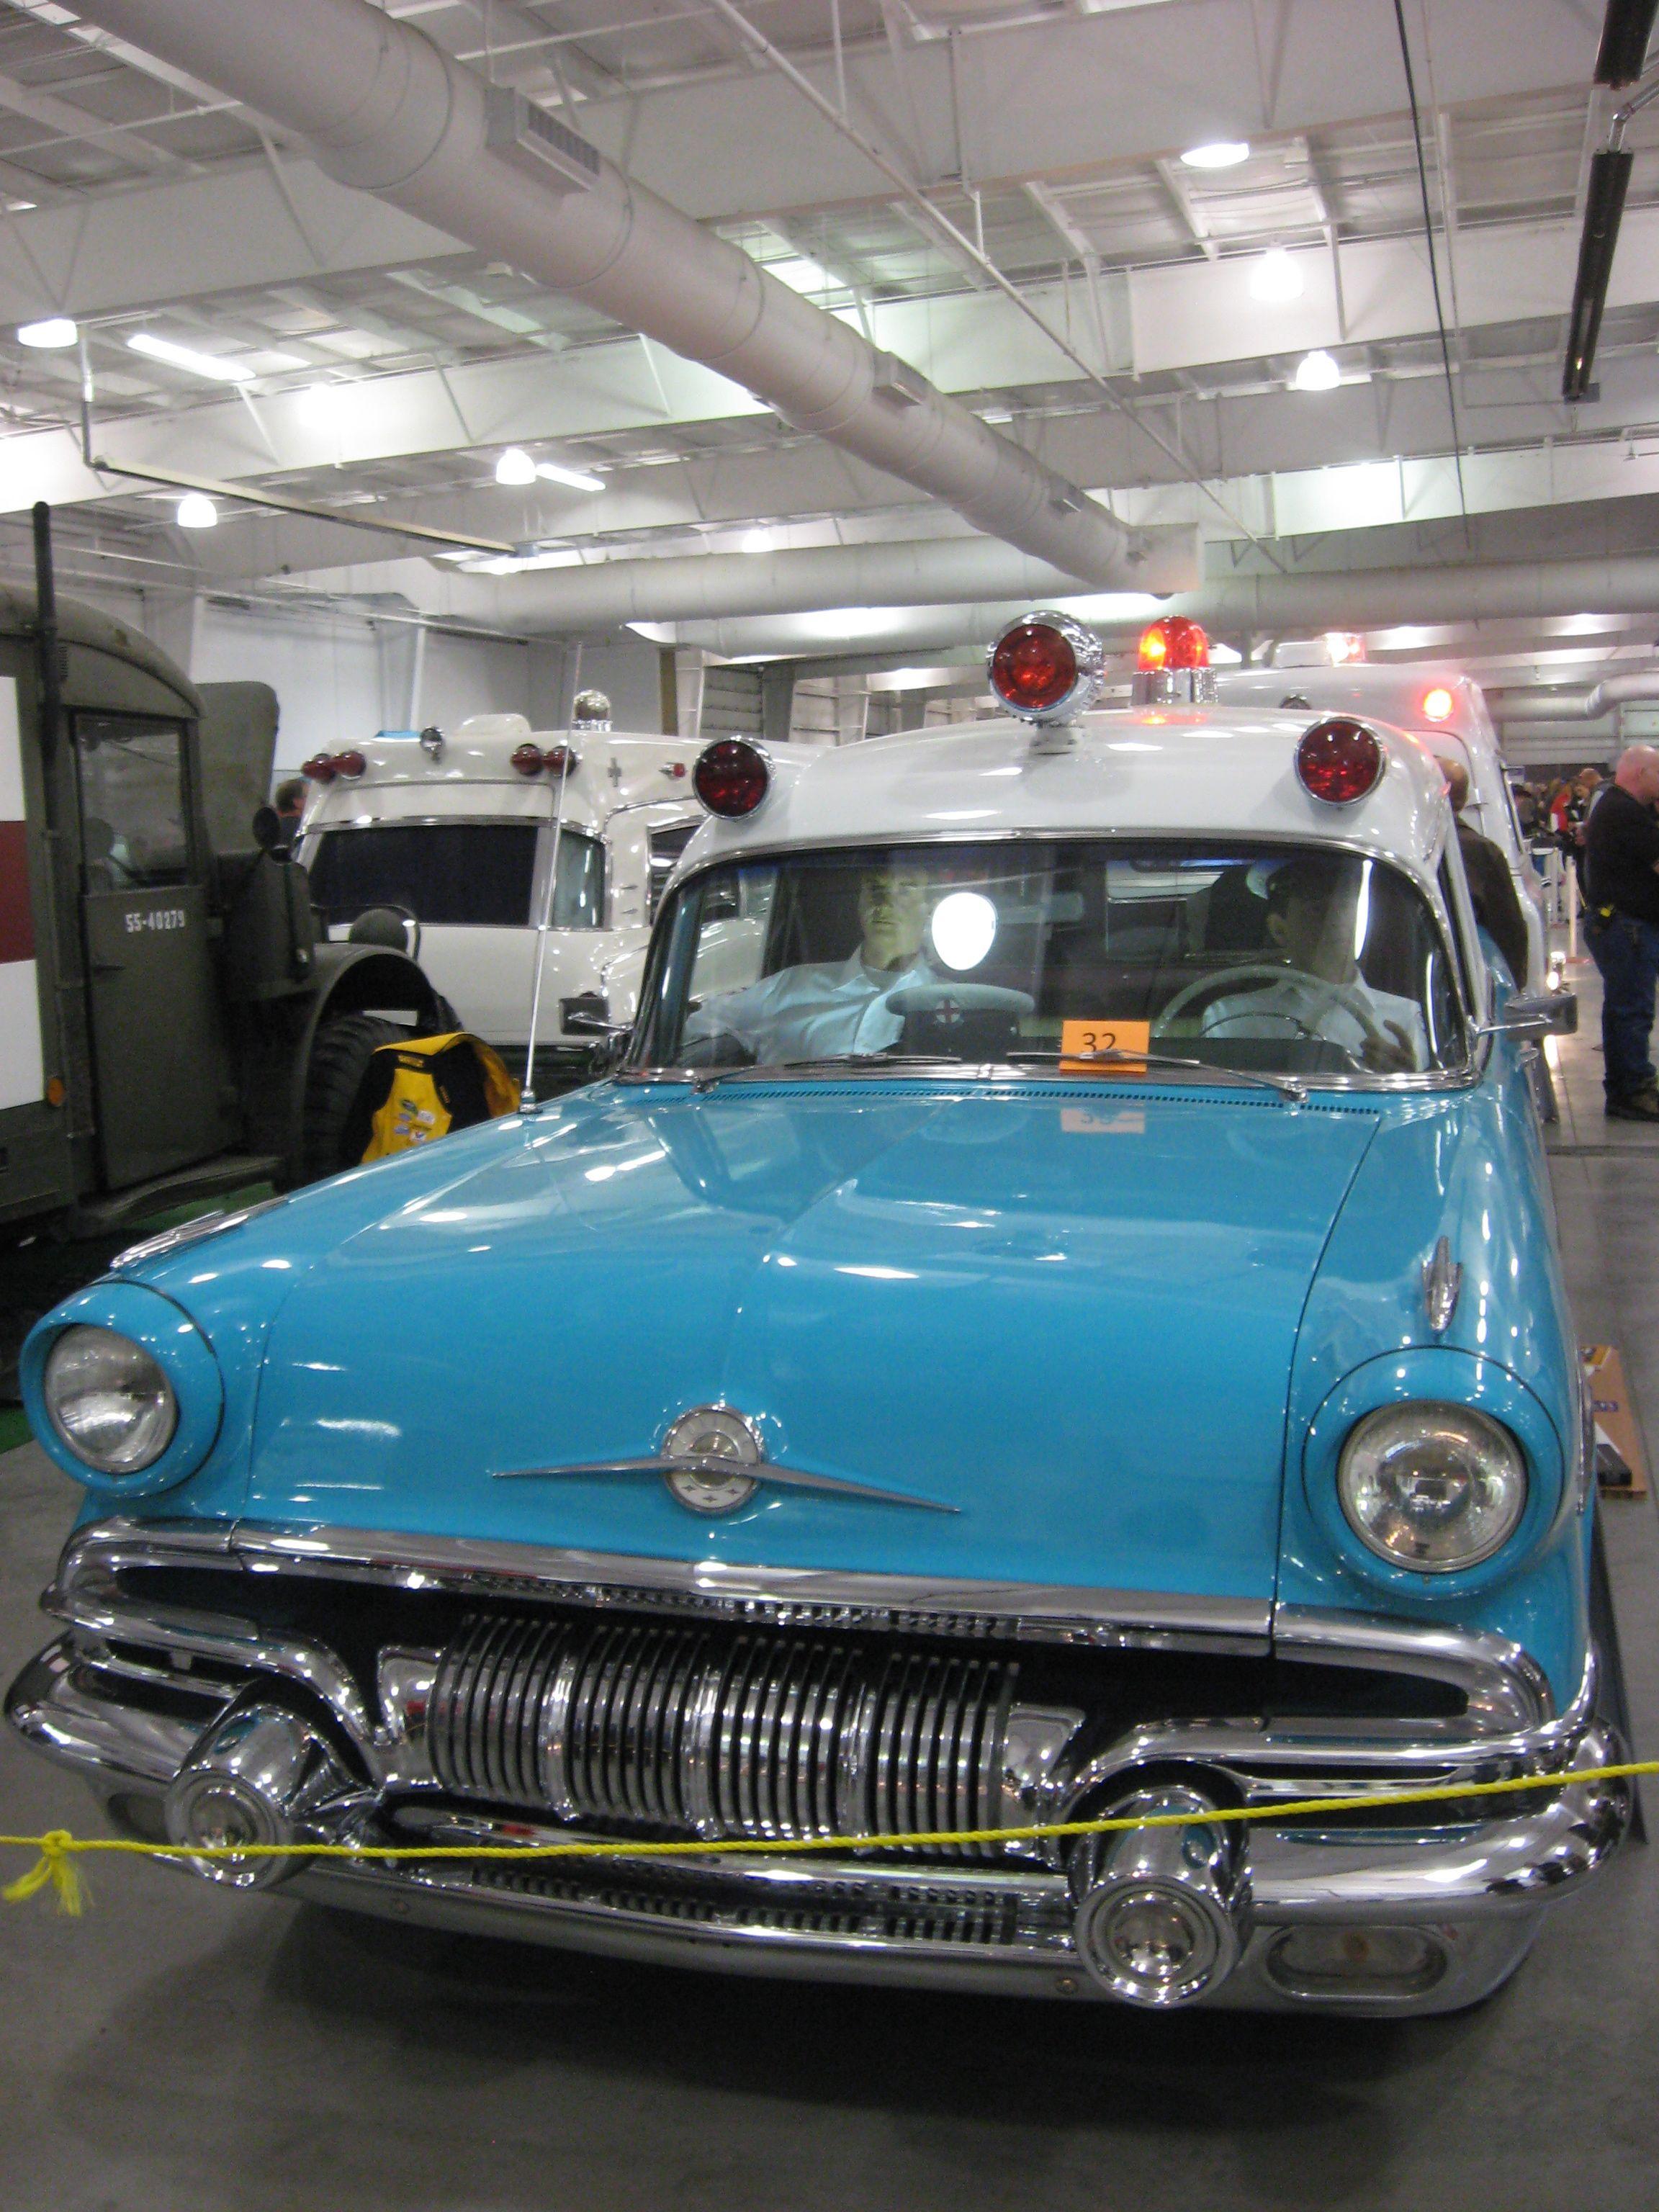 j.r. smith on | Ambulance, Vehicle and Vintage